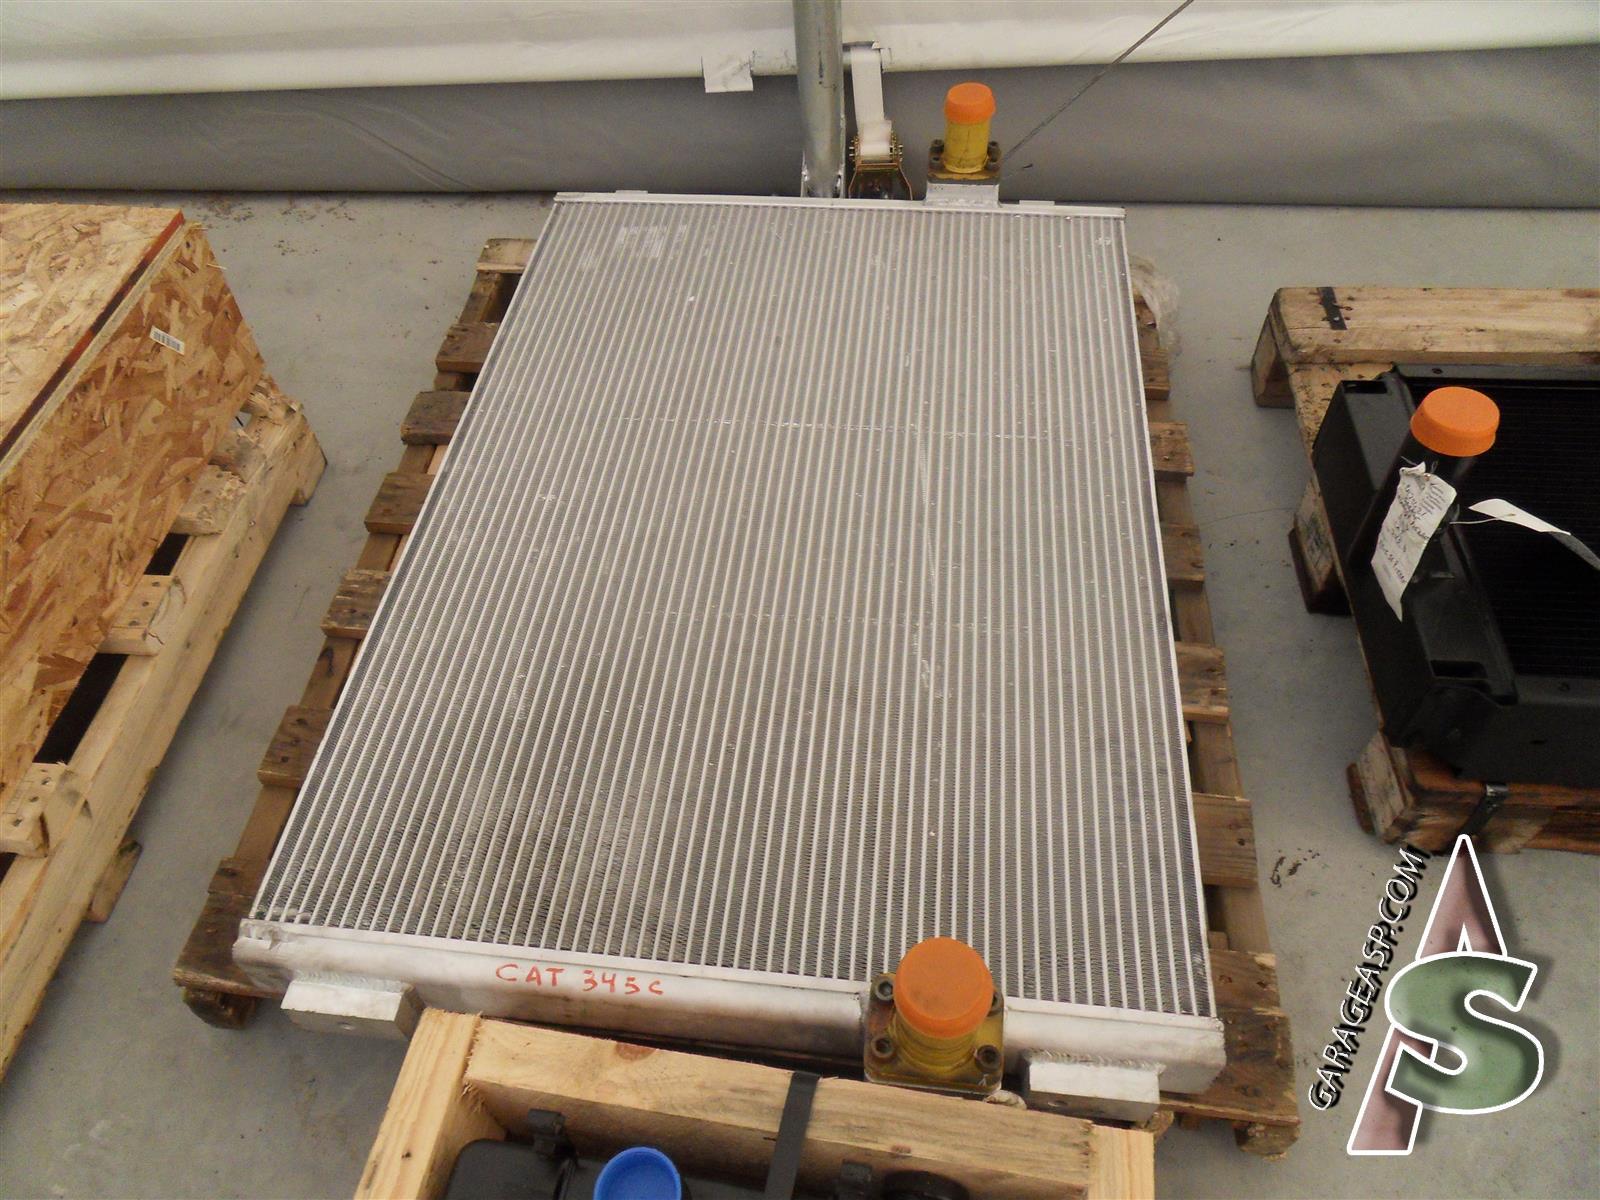 Caterpillar Radiators and Coolers - Heavy equipment parts